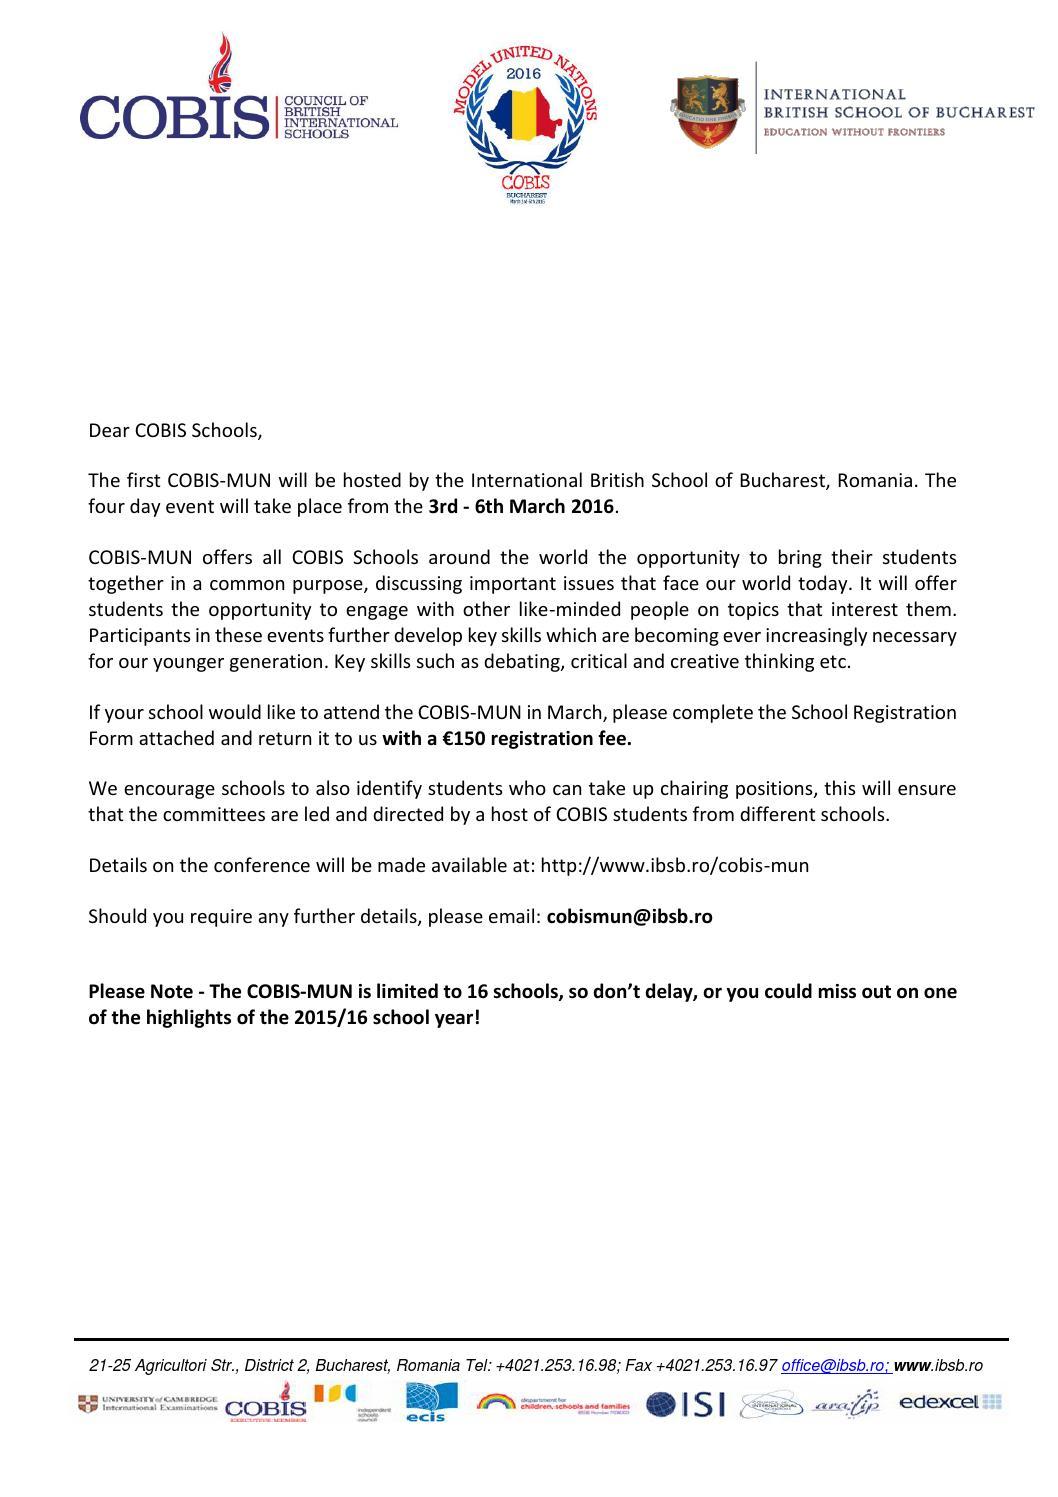 COBIS MUN Invitation Letter By International British School